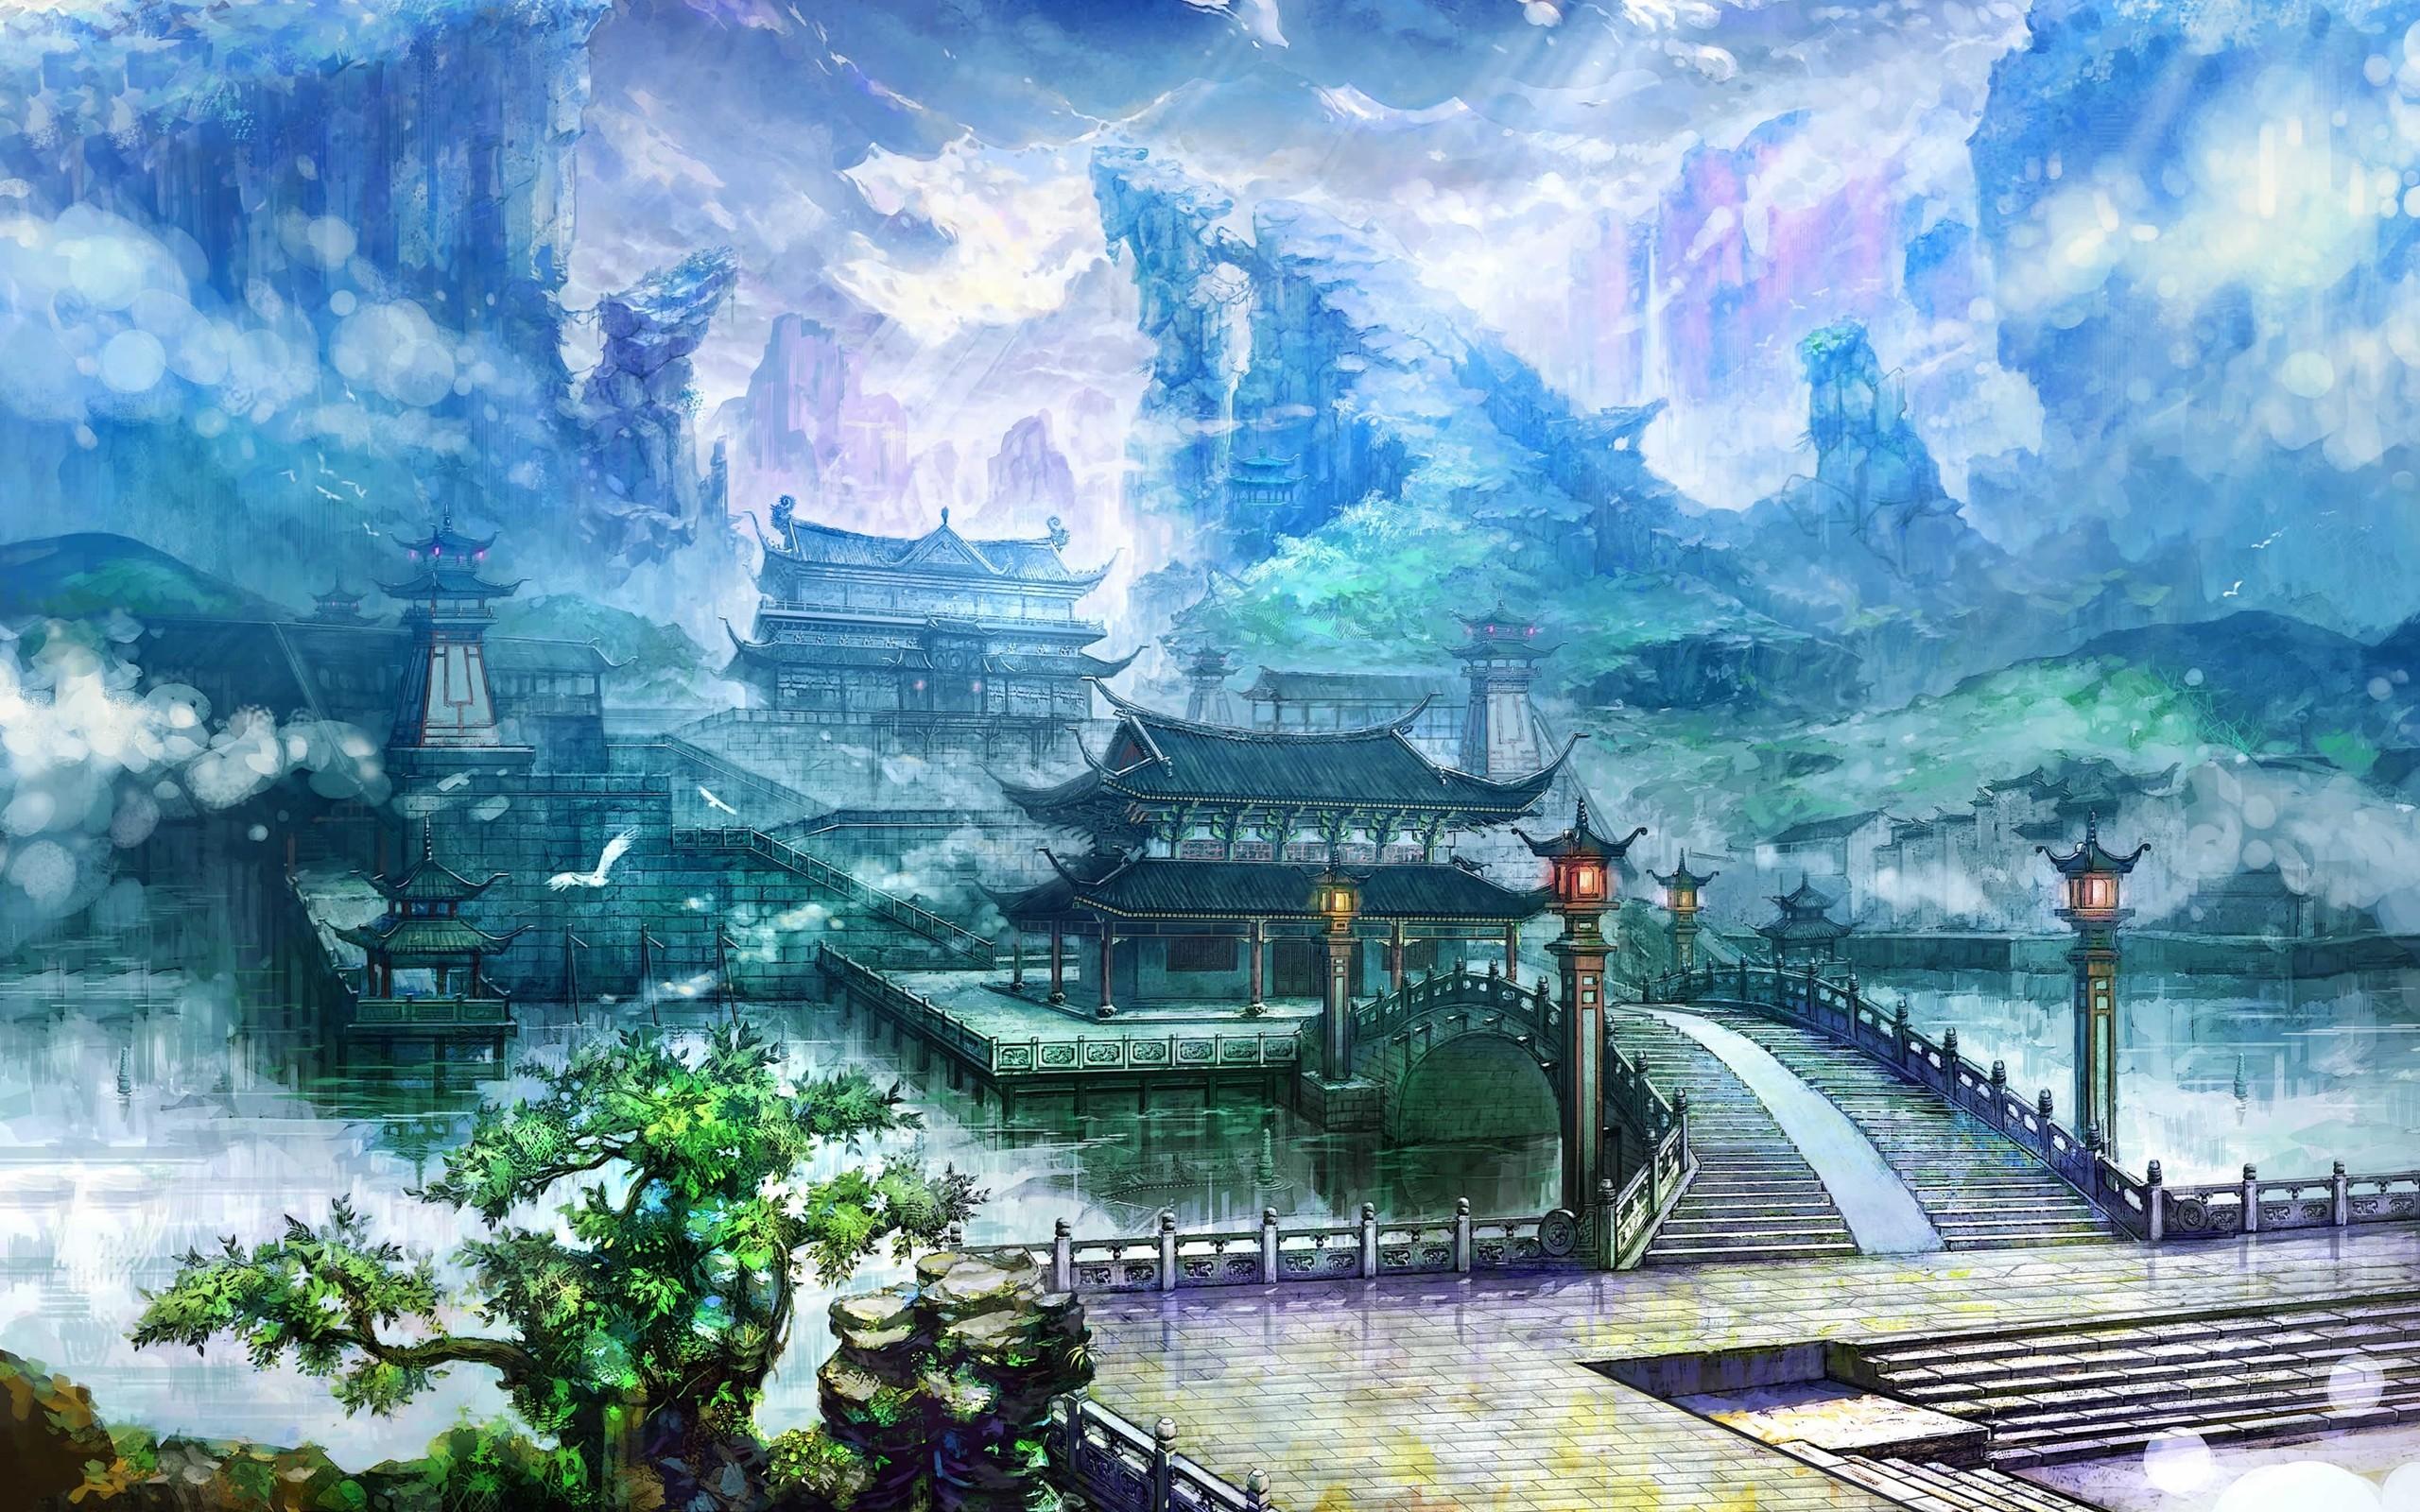 2560x1600 Chinese Landscape Wallpaper China Art Landscape Chinese Landscape Watercolor Painting 2560x1600 Wallpaper Teahub Io